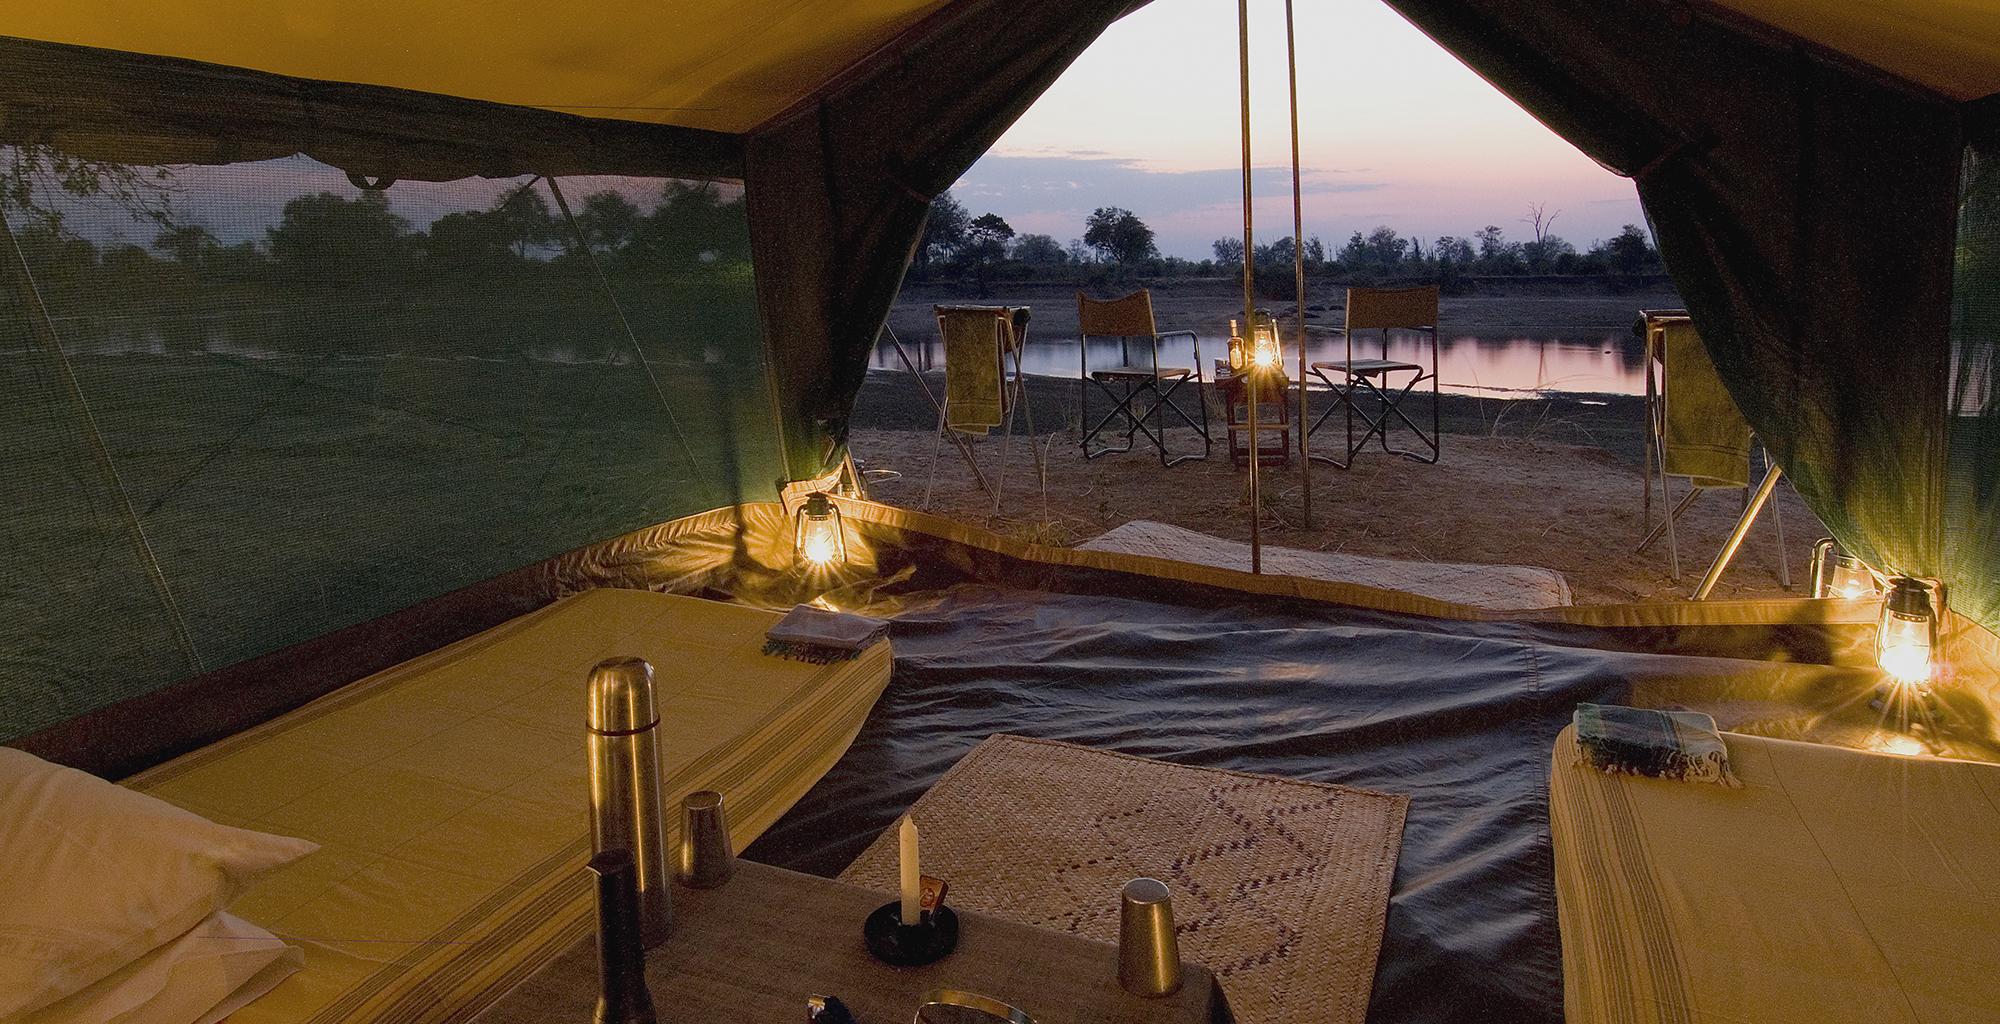 Zambia-Luangwa-Bush-Camp-Tent-Interior